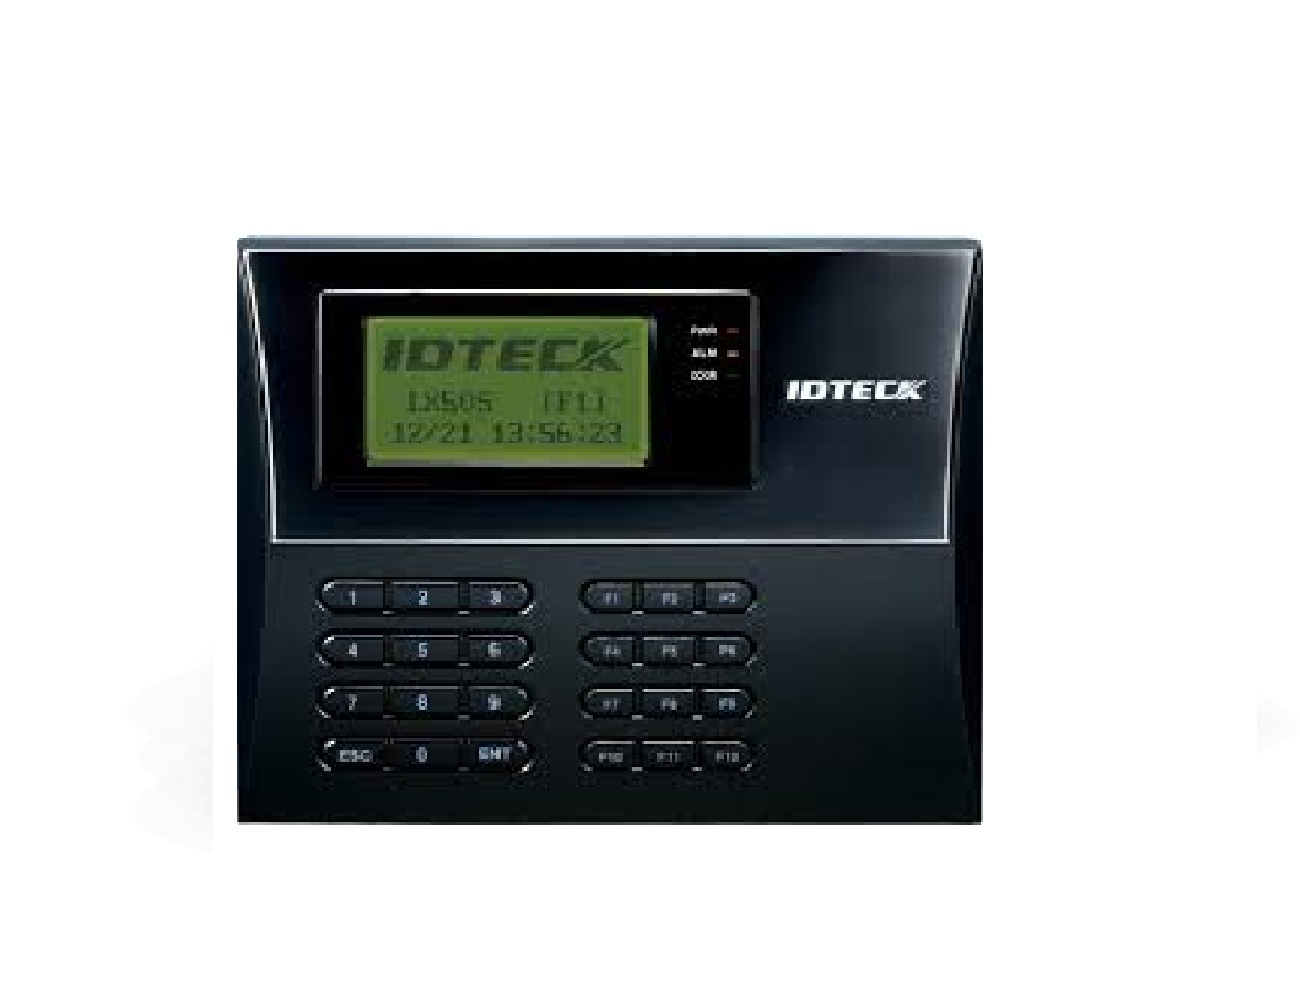 Đầu đọc kiểm soát cửa IDTECK IP505R